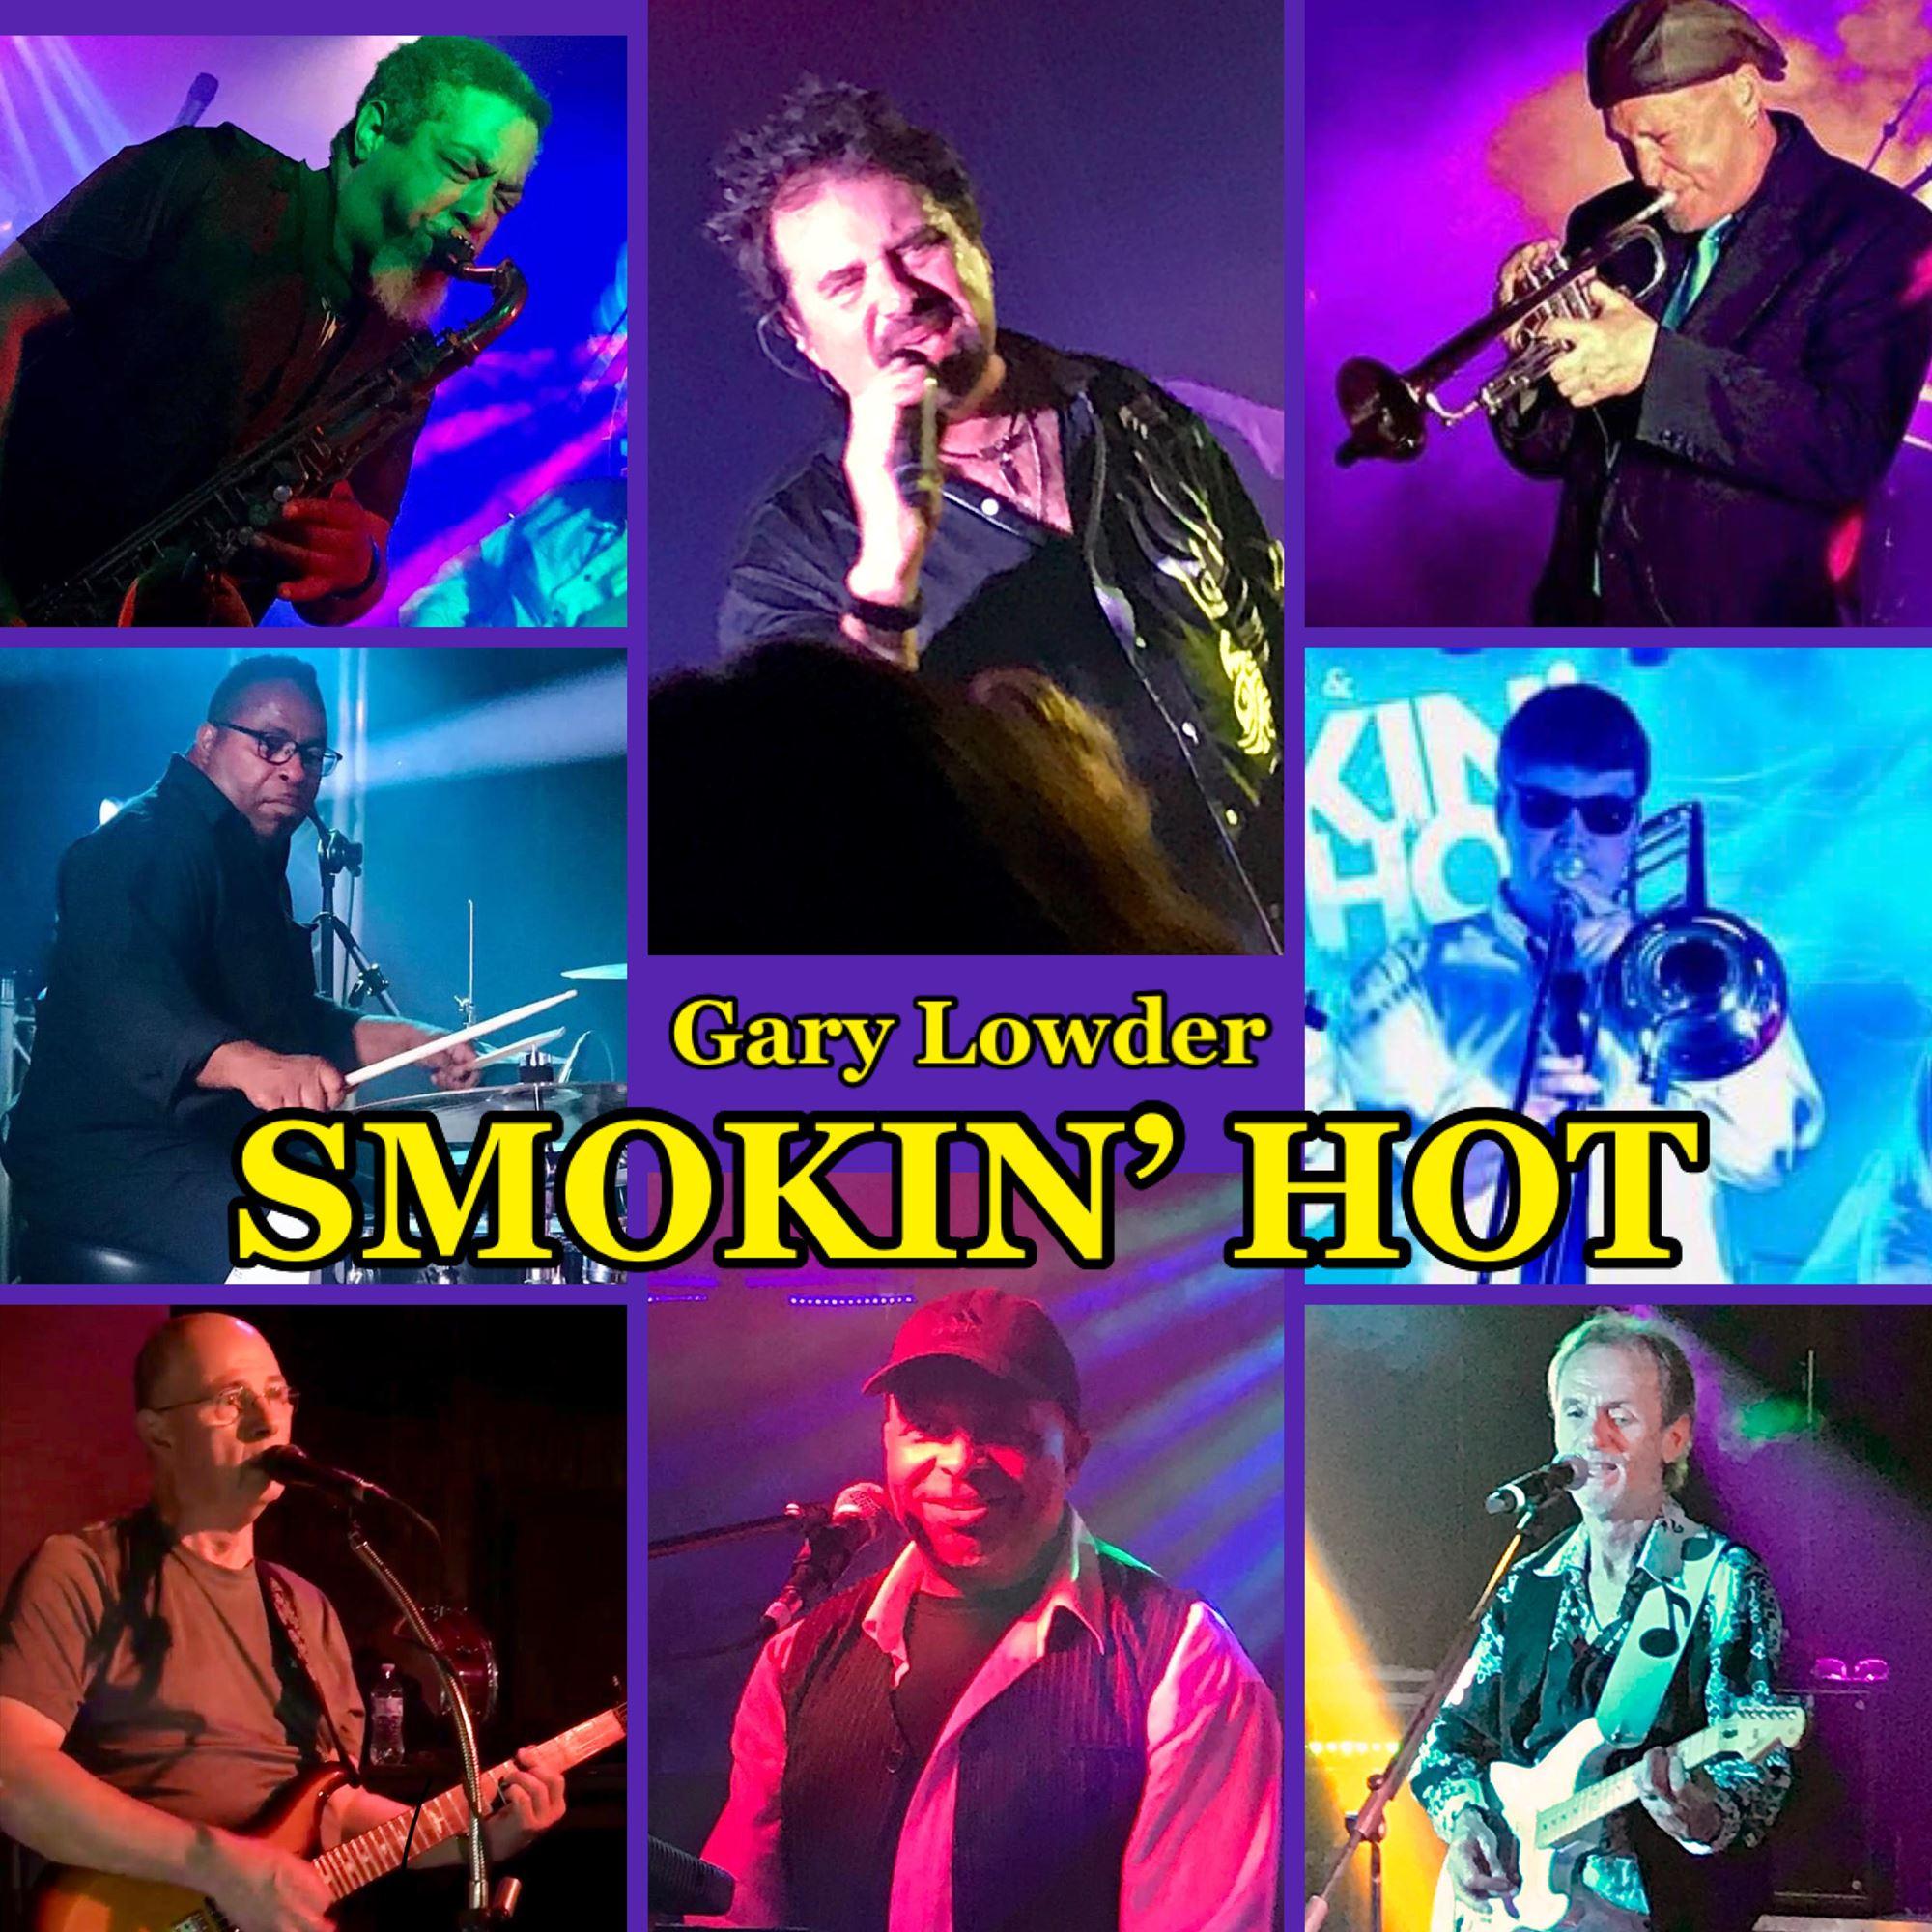 Gary Lowder and Smoking Hot